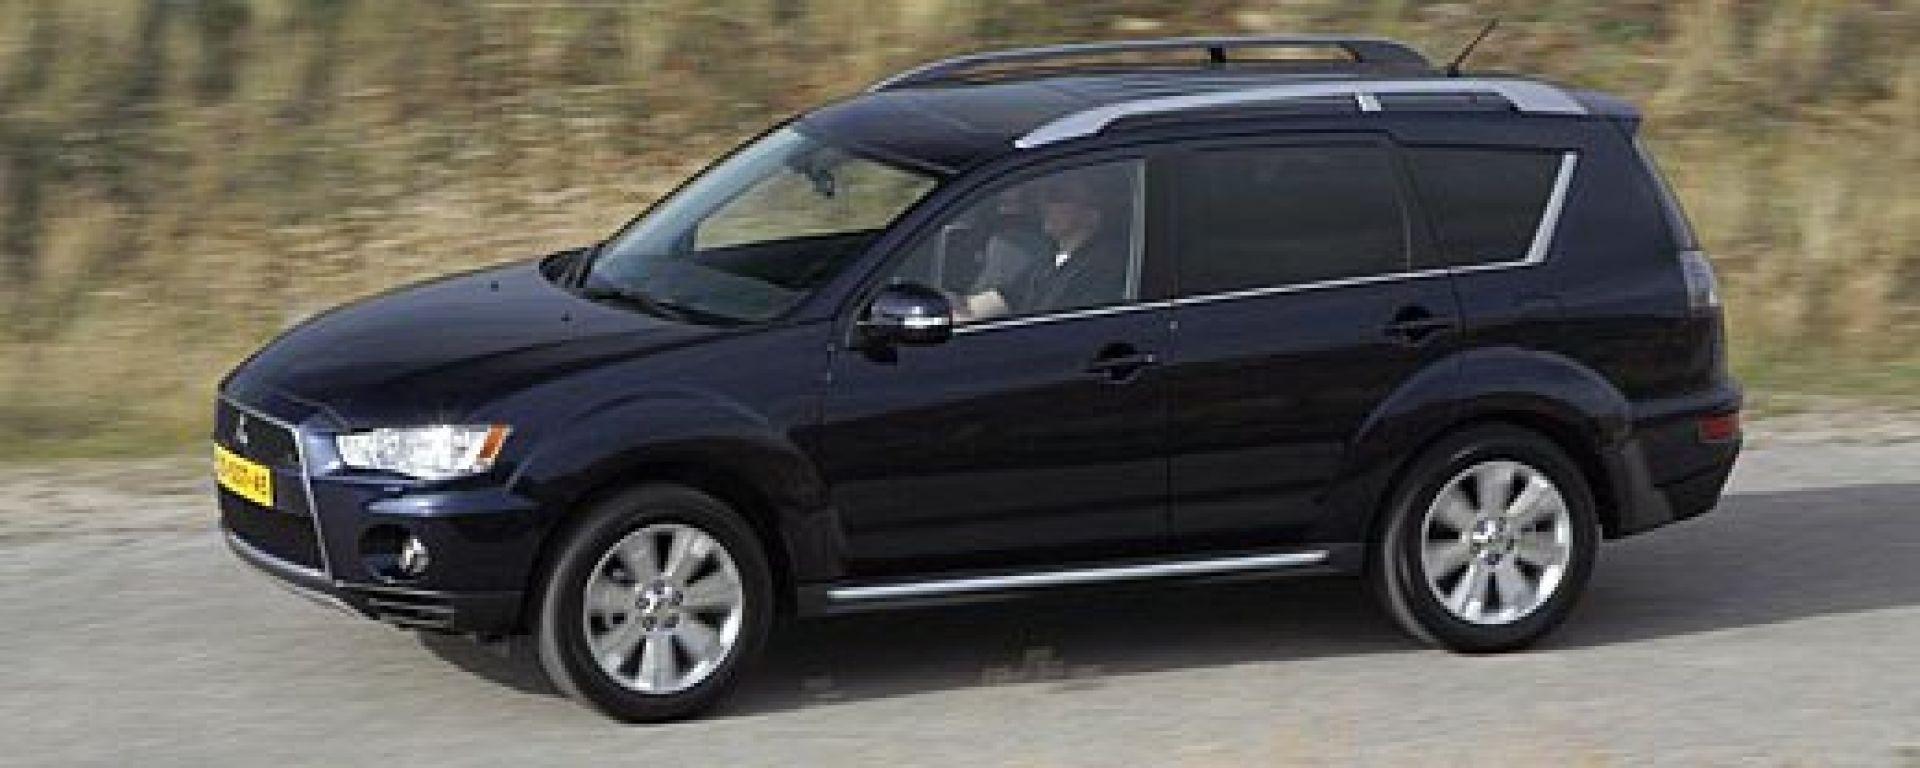 Mitsubishi Outlander 2010 2.2 DiD TC-SST